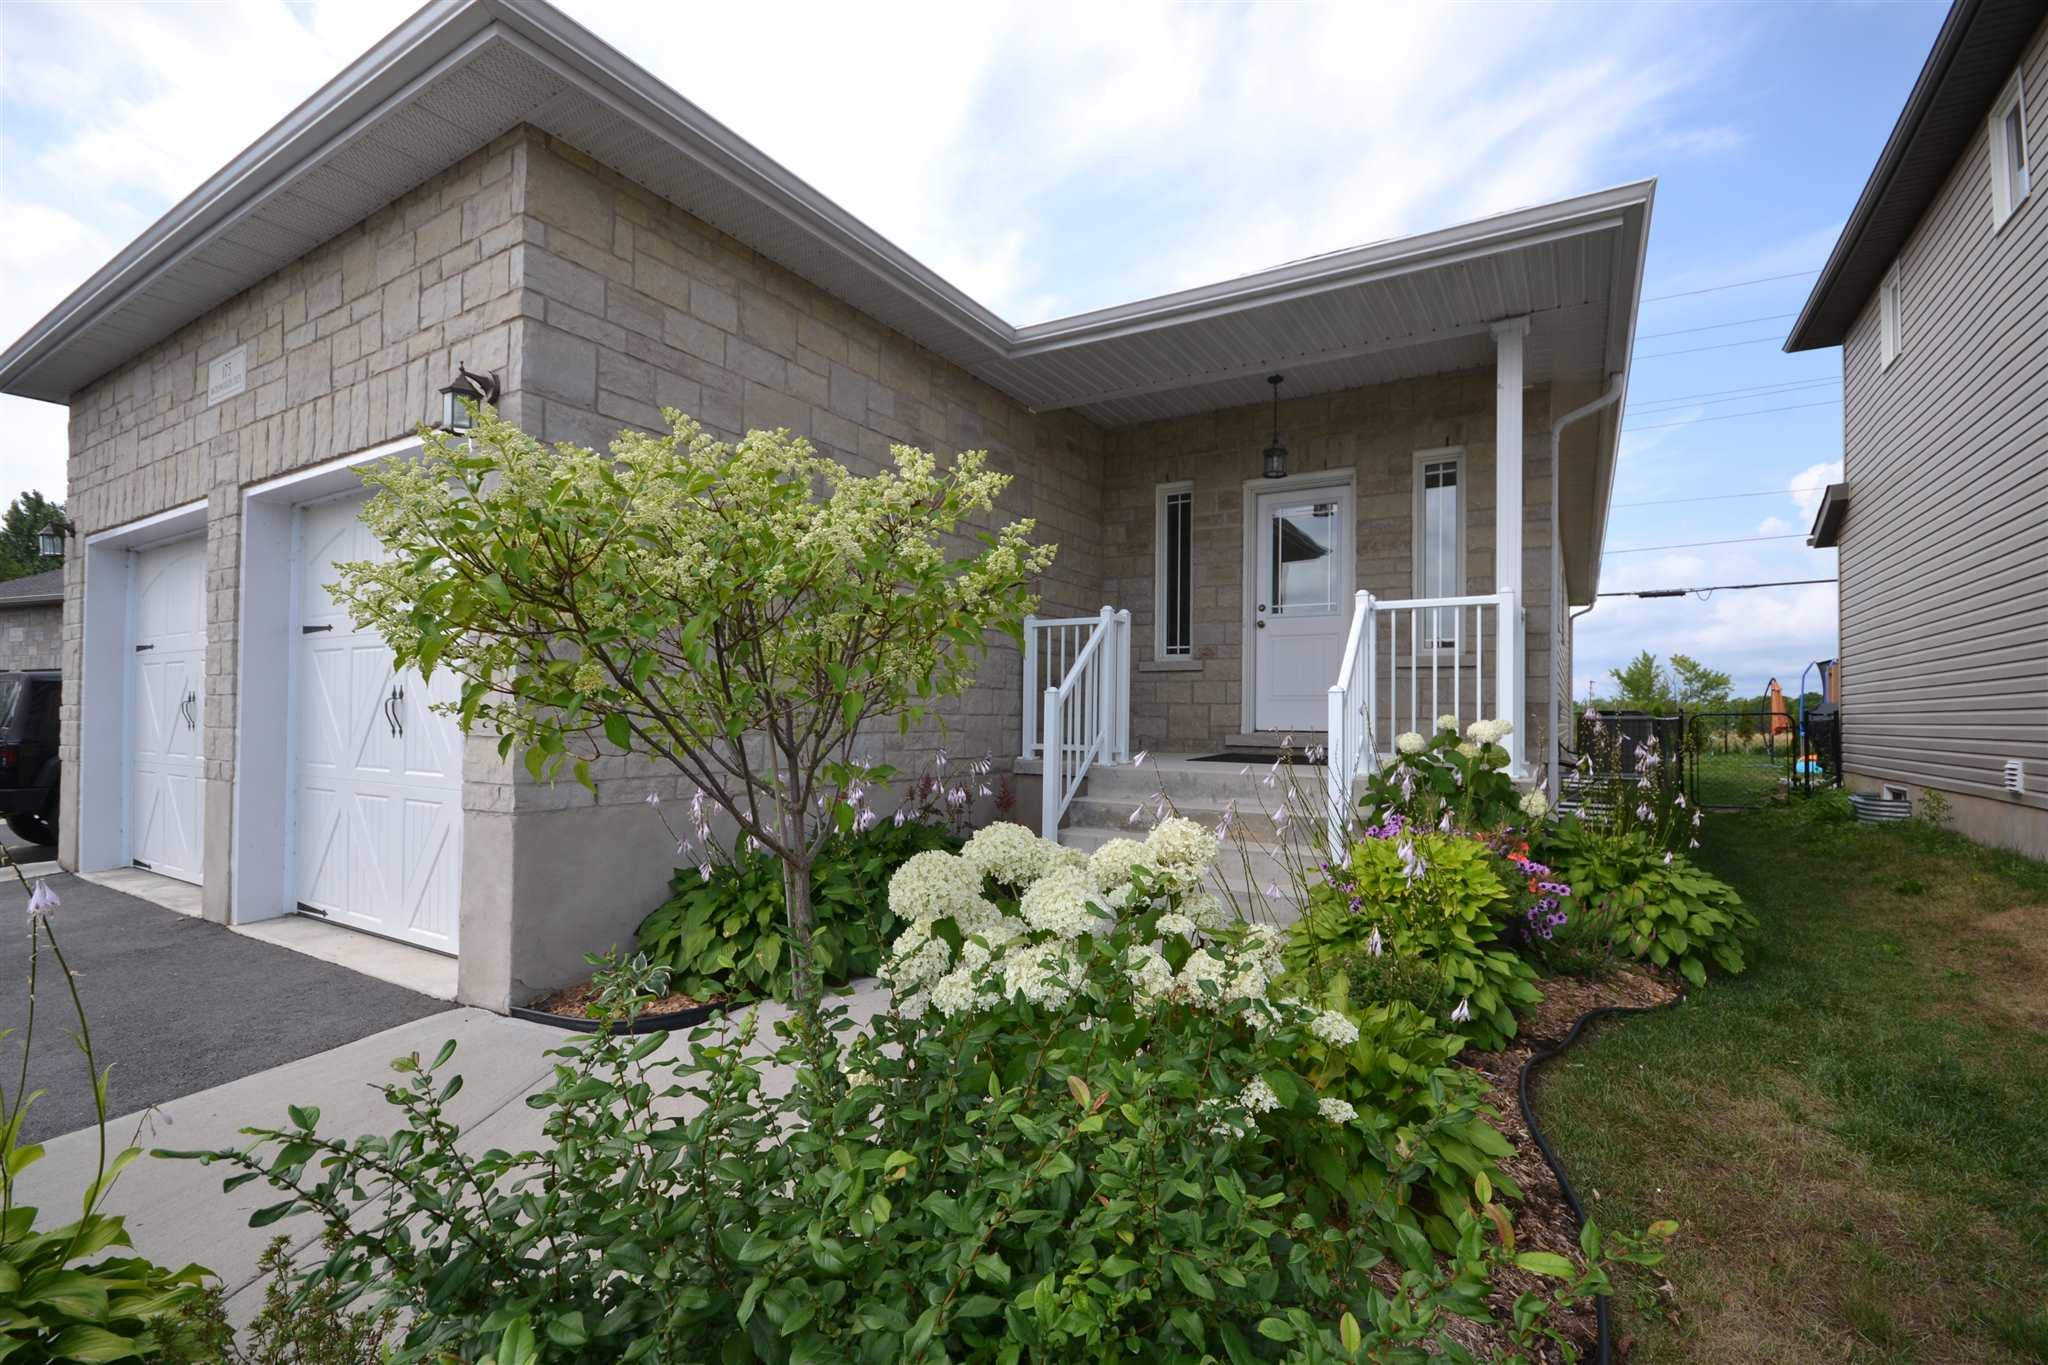 175 mcdonough crescent, Amherstview Ontario, Canada